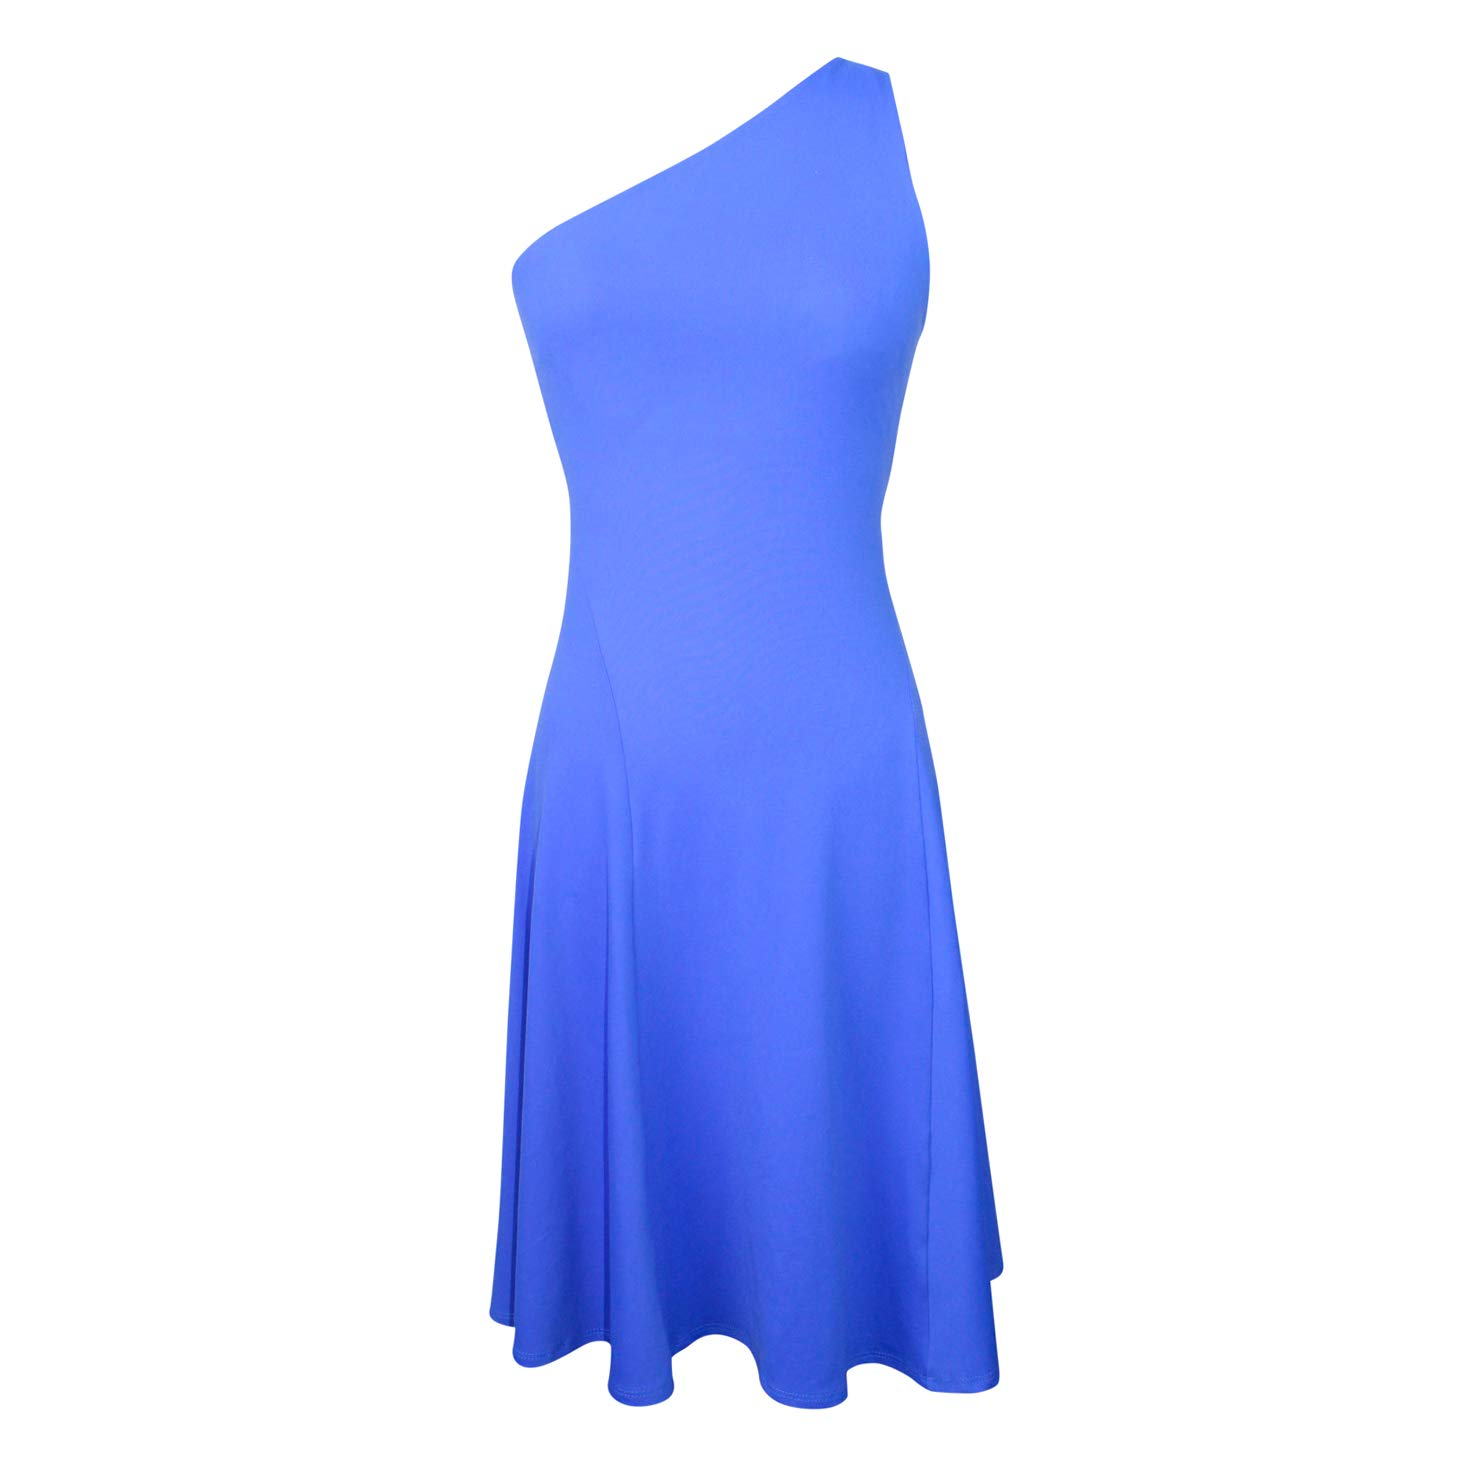 Susana Monaco Womens Ivy One Shoulder Flare Dress Dazzling bluee Extra Small, Small, Medium, Large